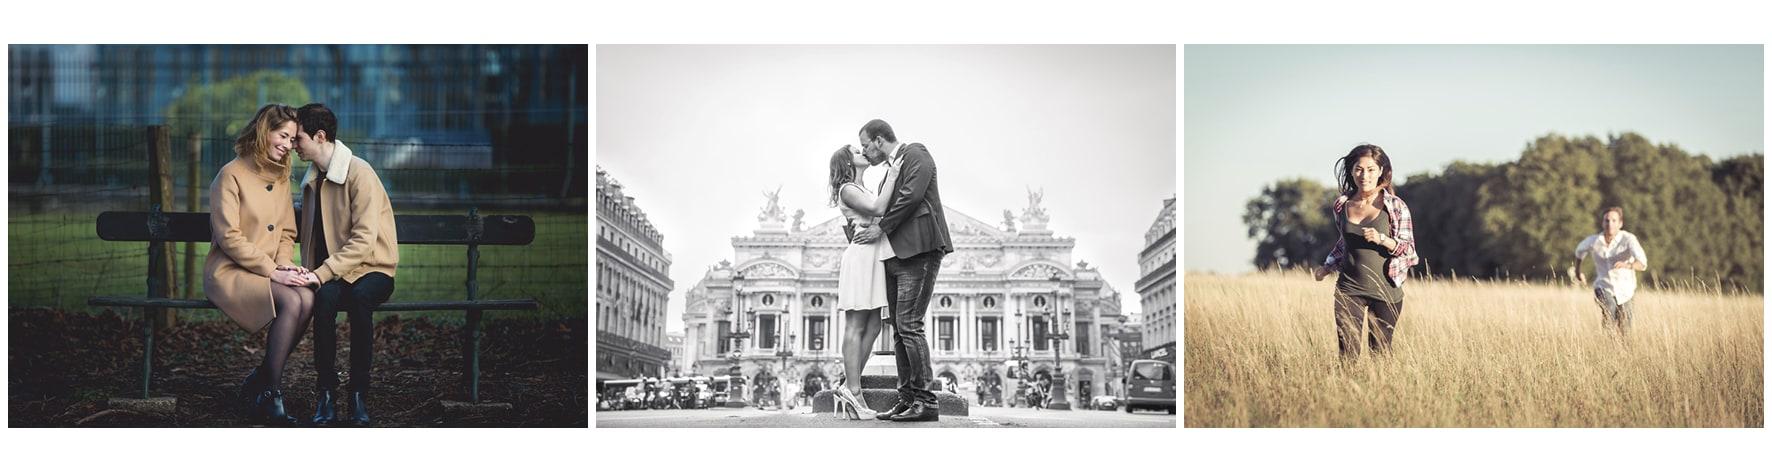 tarif photographe, photographe mariage IDF, www.studioart-photographe.fr, Jean-Baptiste Chauvin